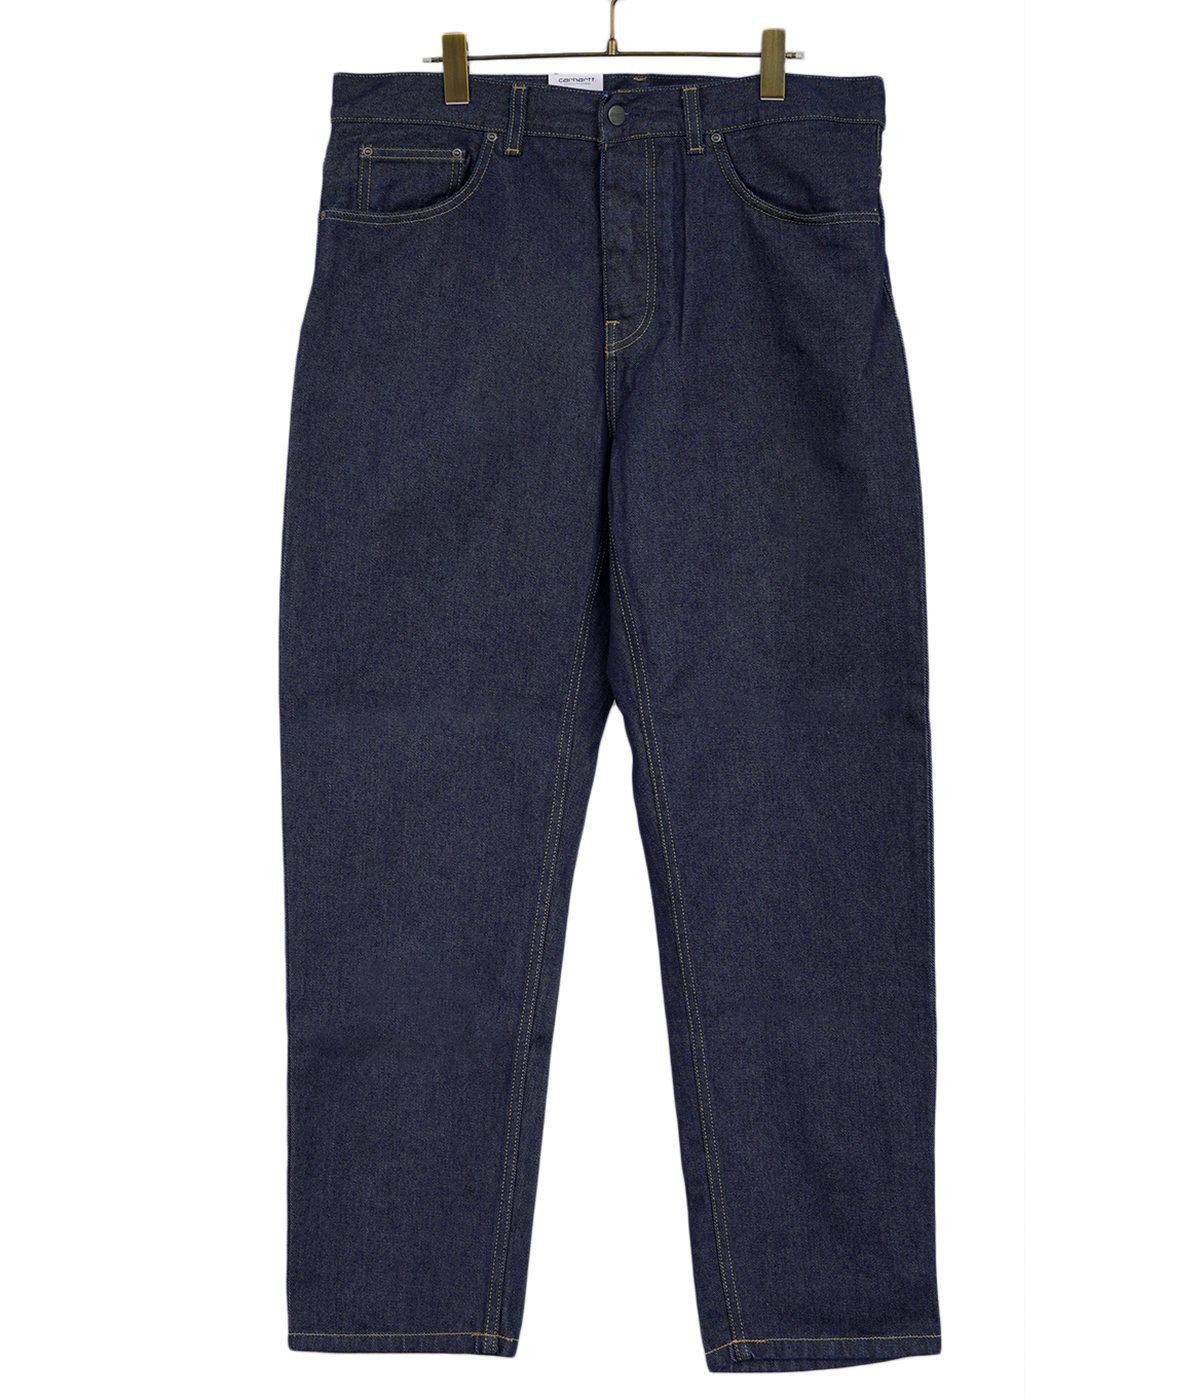 NEWEL PANT -Blue one wash-